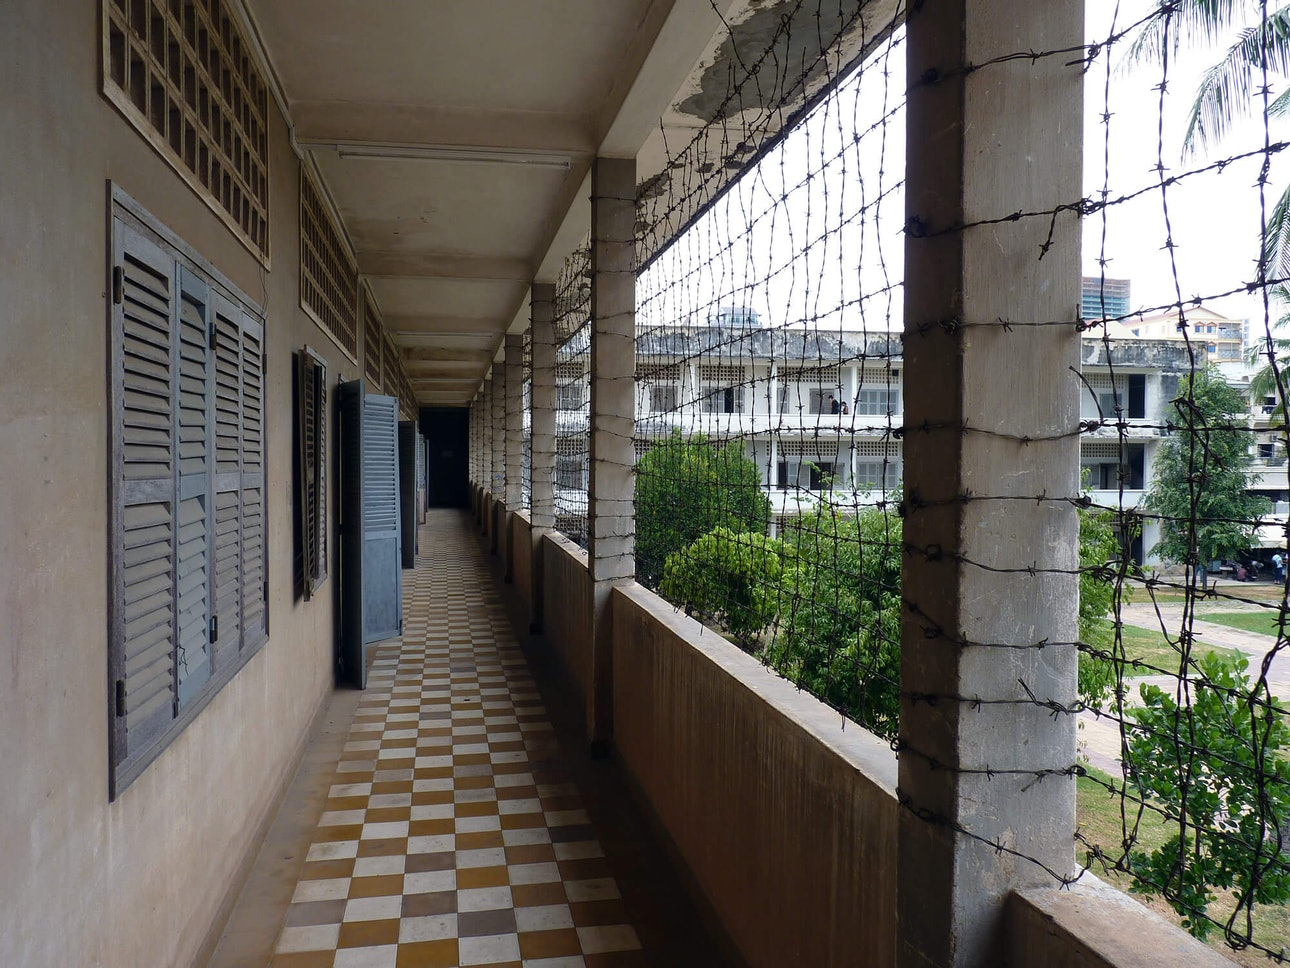 Tuol_Sleng_museum_is_Phnom_Penh_turmy_ugnivenko